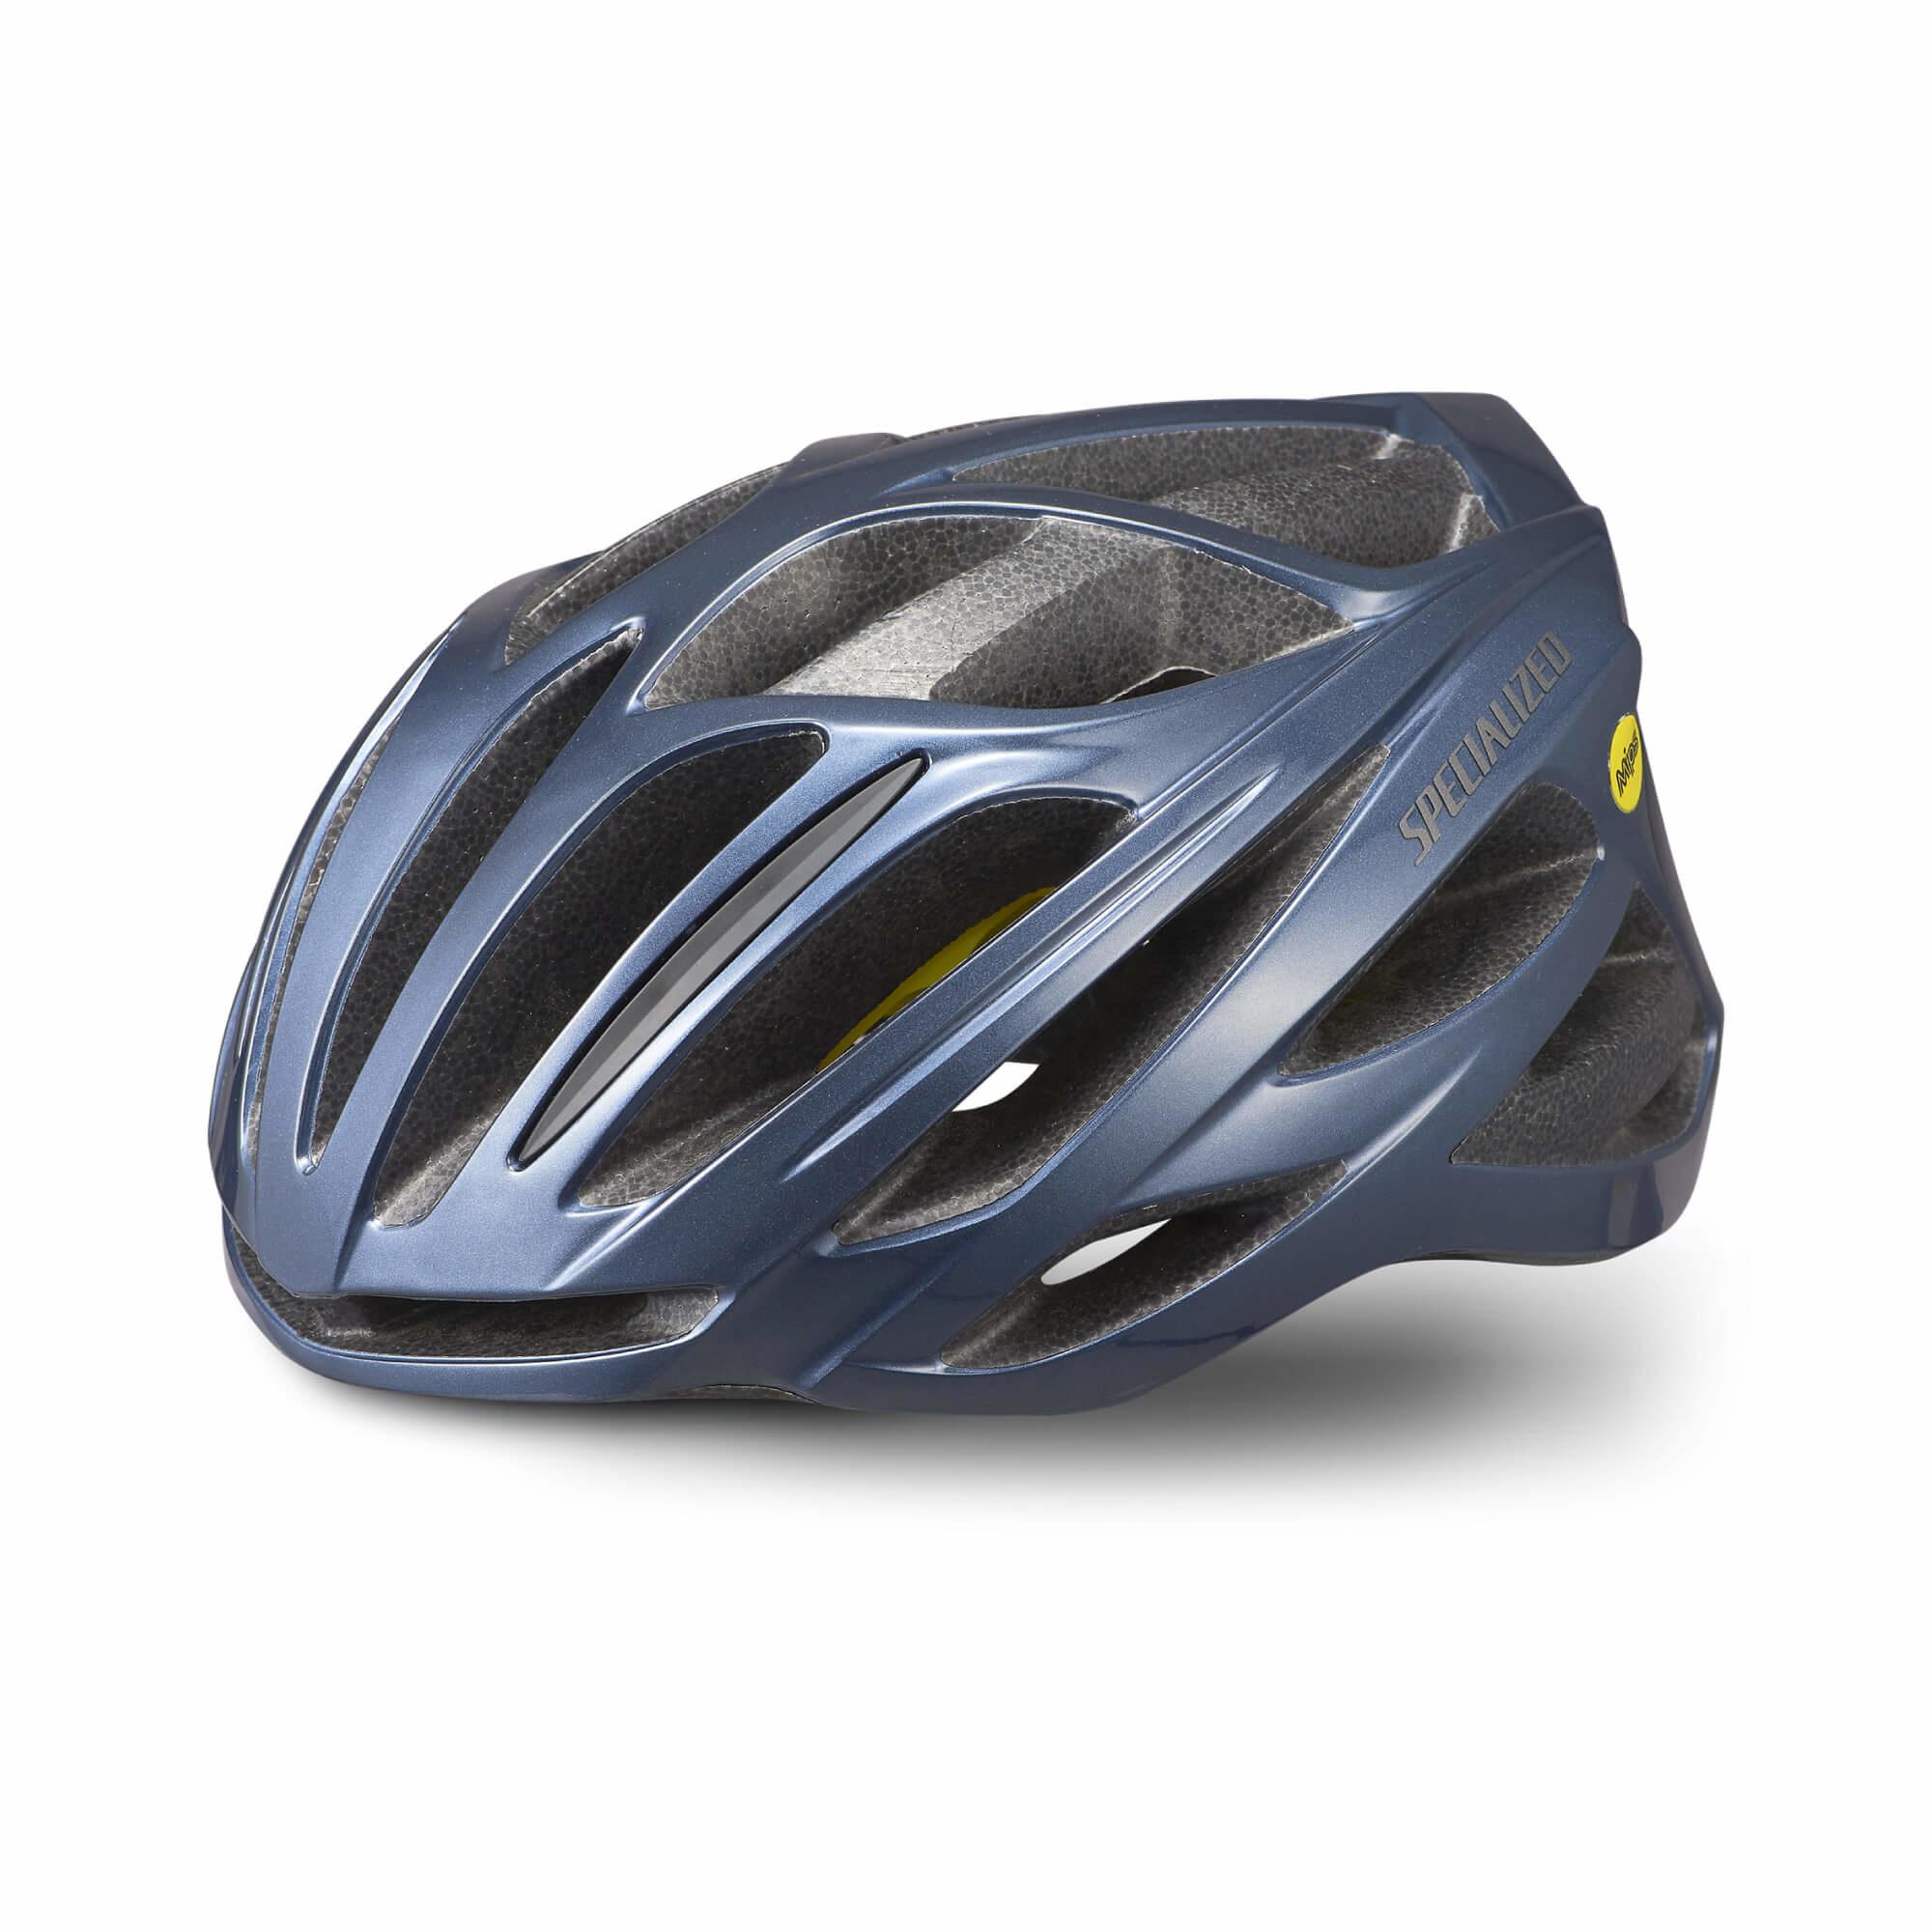 Echelon II Helmet Mips 2022-2